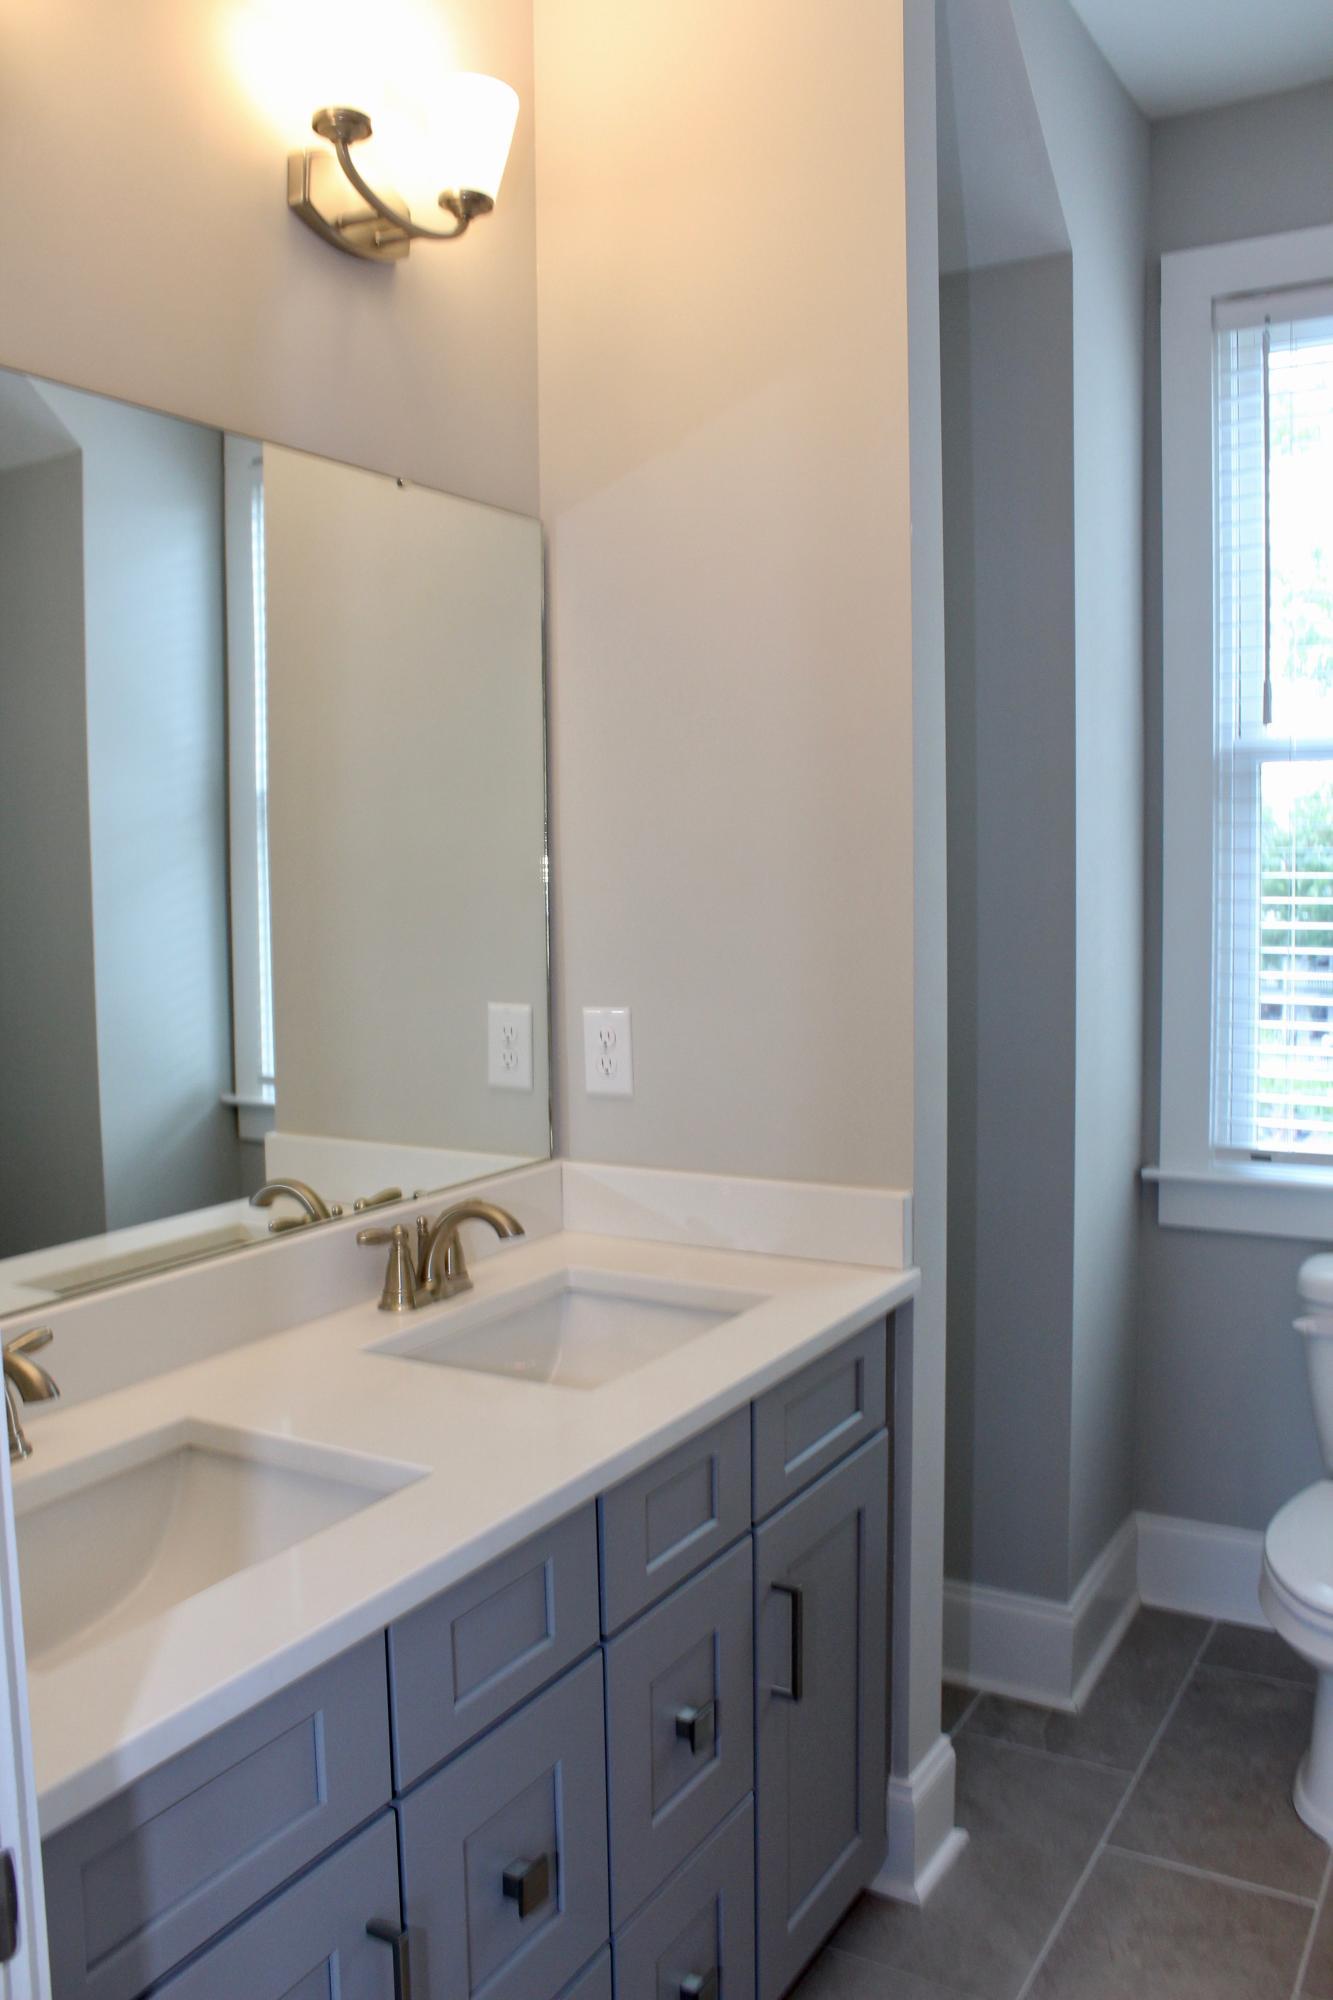 Morris Square Homes For Sale - 41 Dereef, Charleston, SC - 3